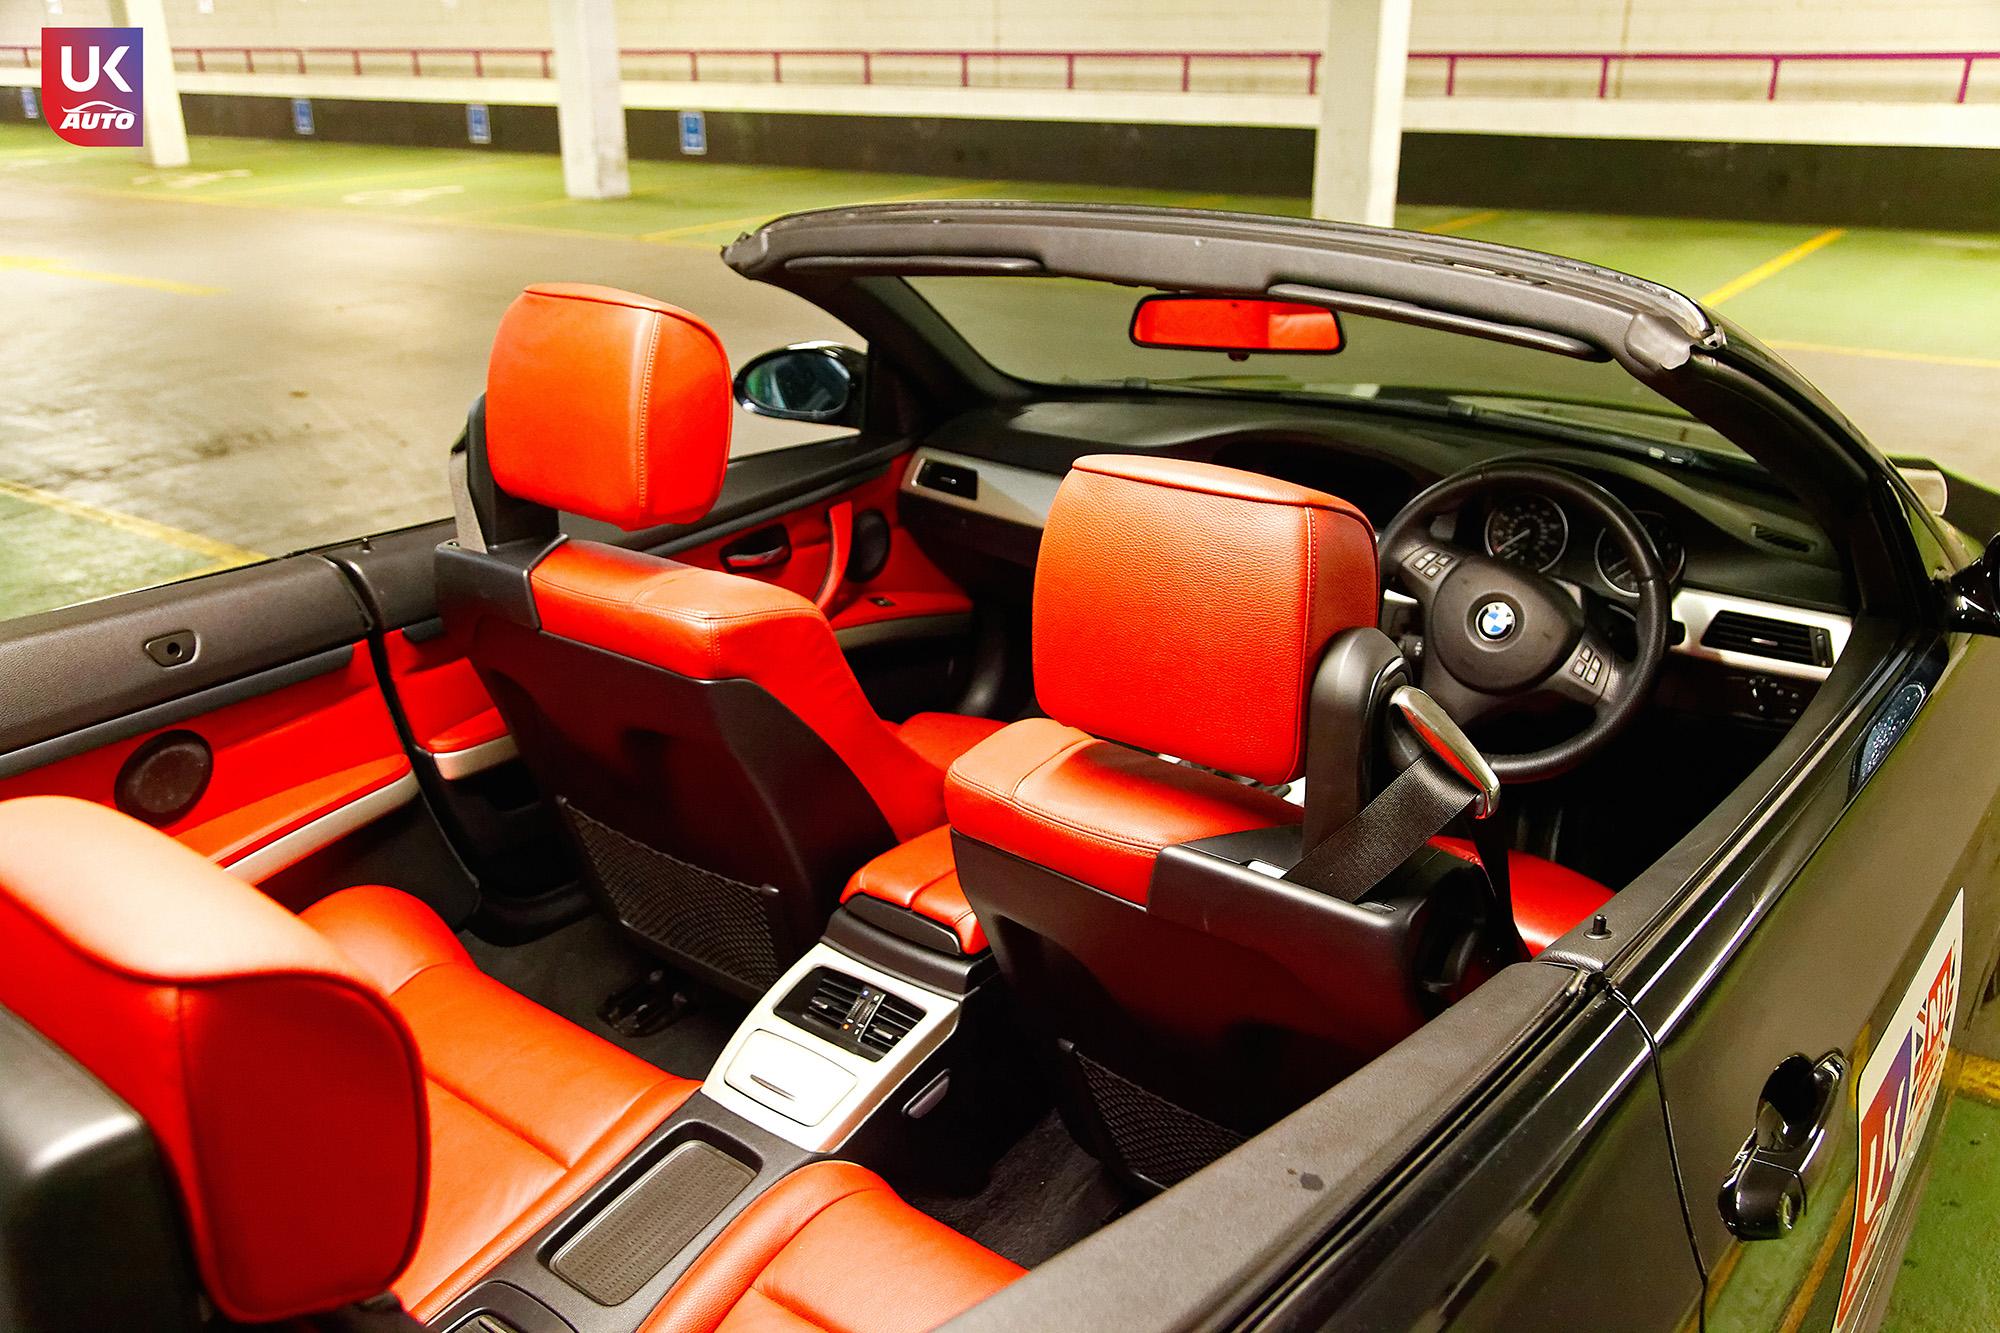 UKAUTO IMPORT ANGLETERRE BMW 335i CABRIOLET UKA RHD22 - Felecitation a Jeremie pour cette BMW 335i cabriolet RHD PACK M IMPORT AUTO ANGLAISE